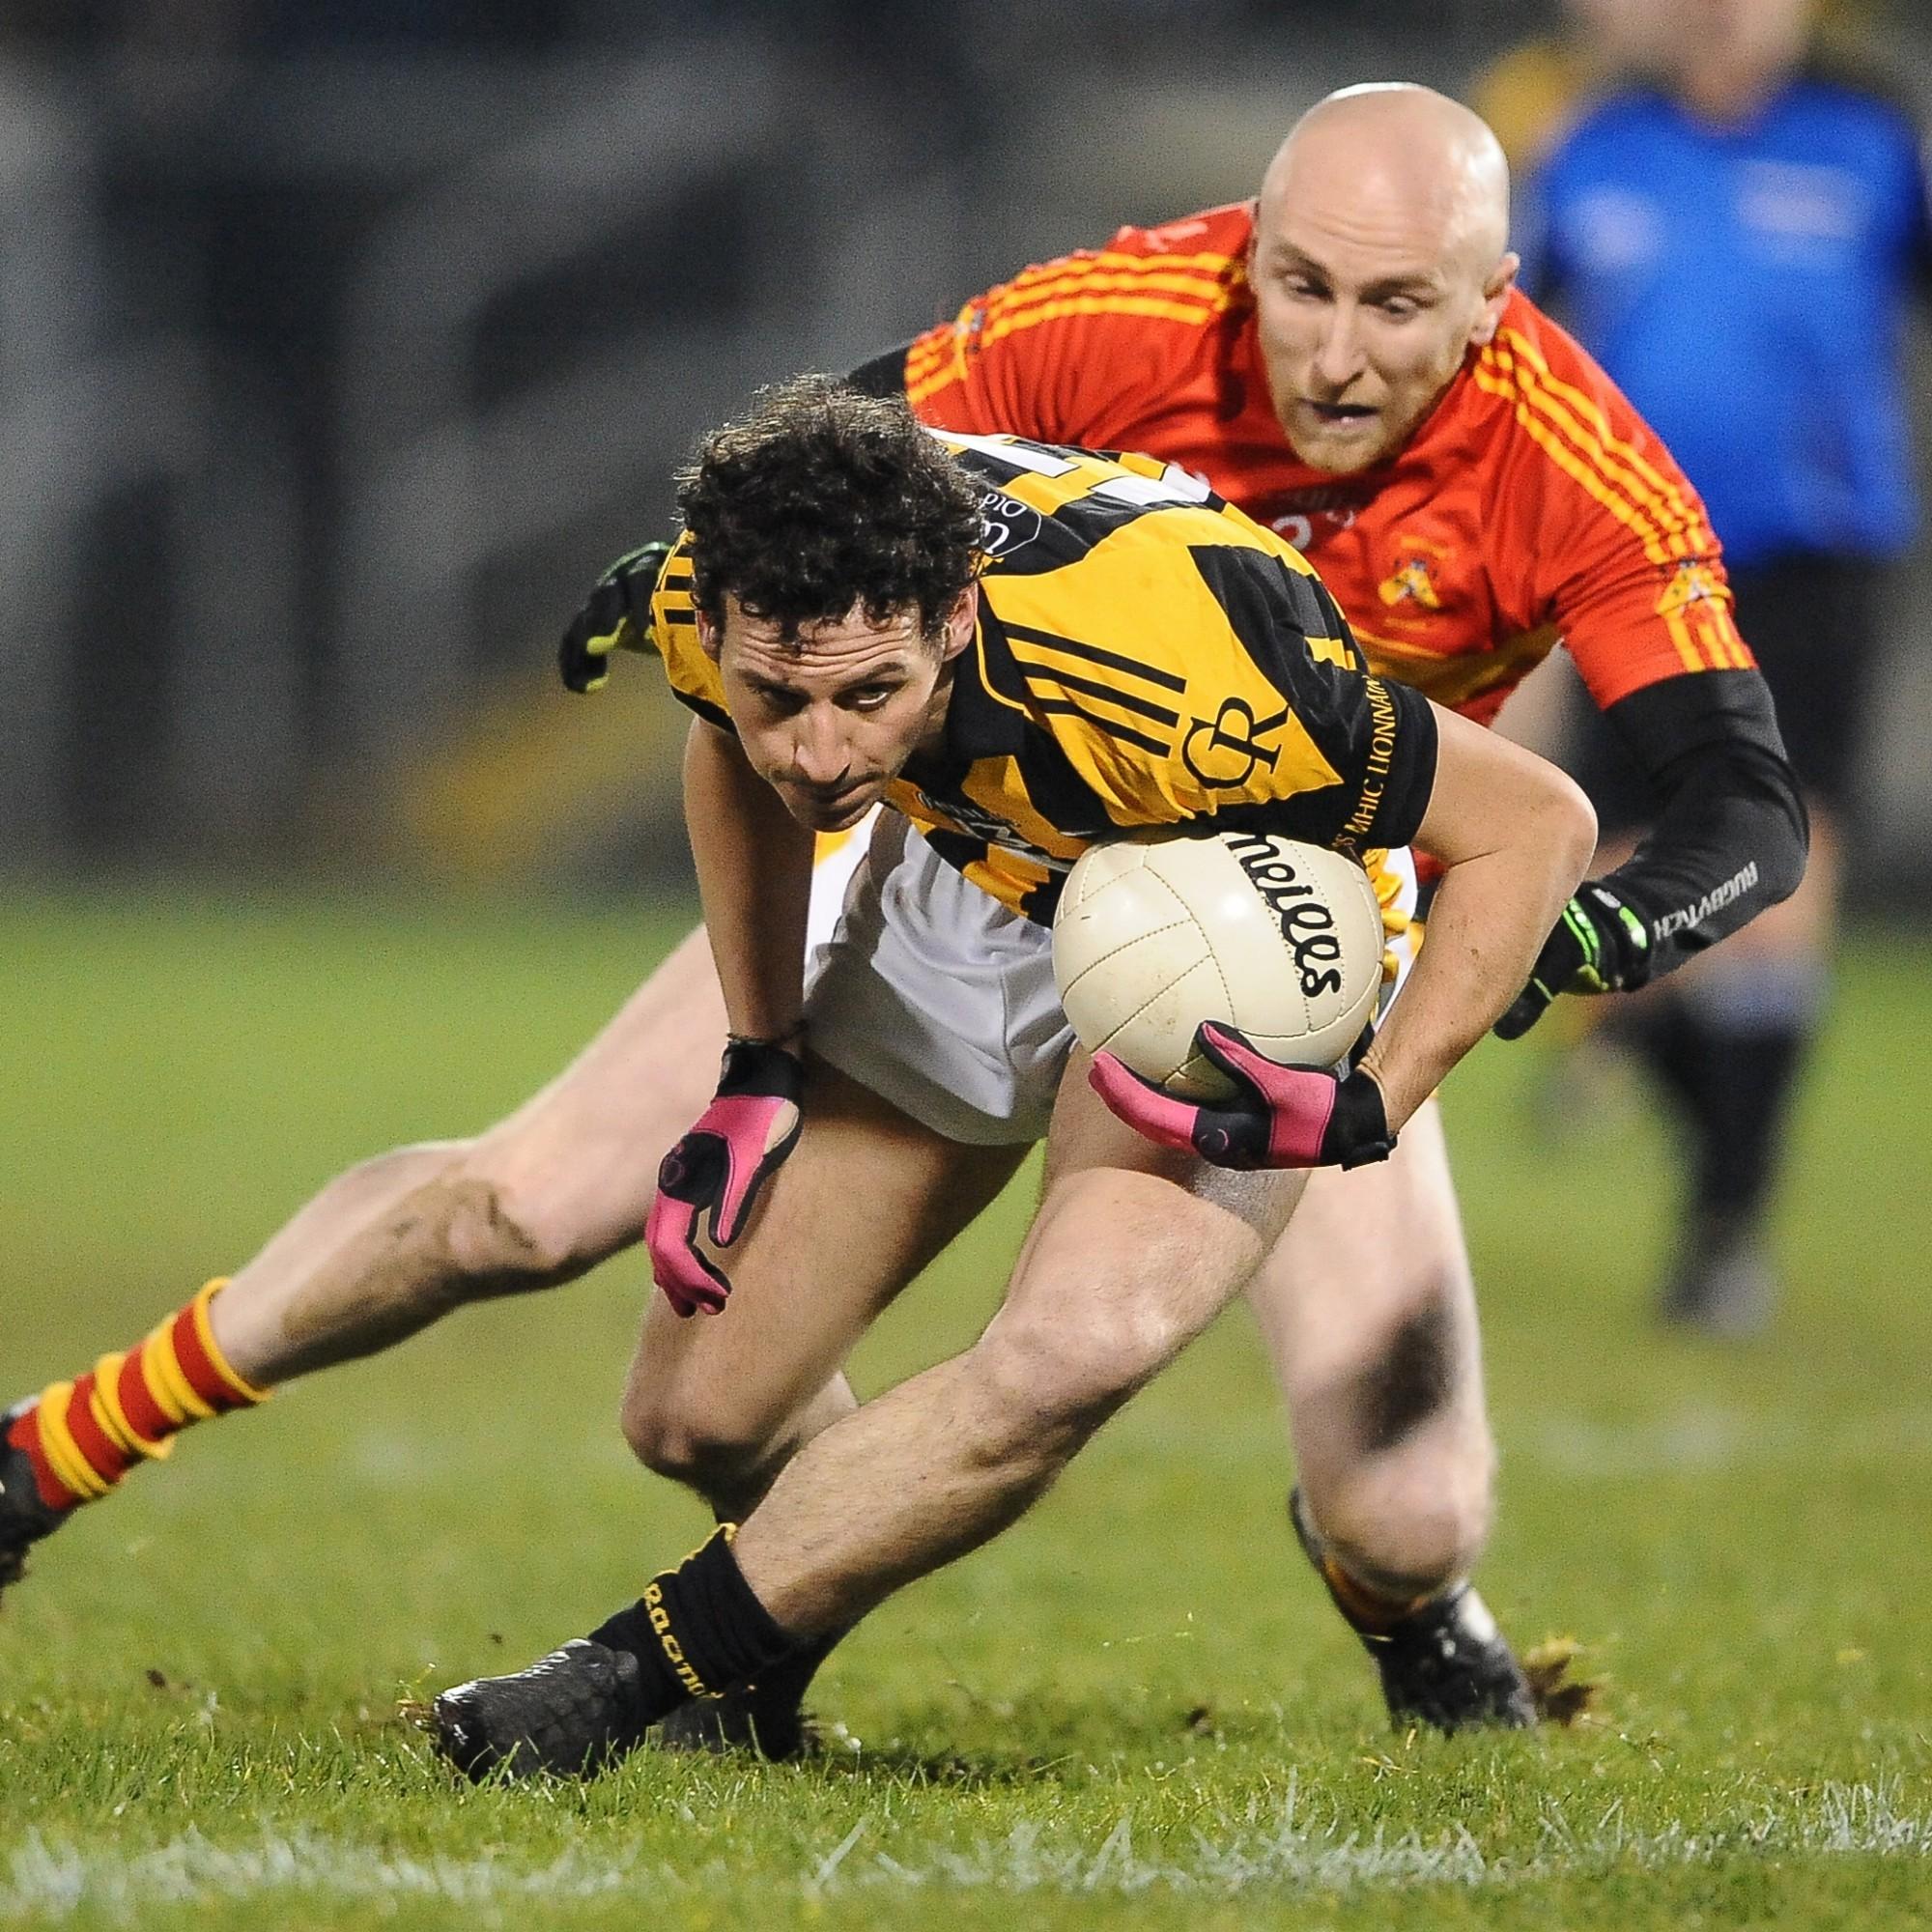 As it happened: Crossmaglen Rangers v Castlebar Mitchels, All-Ireland Club SFC semis